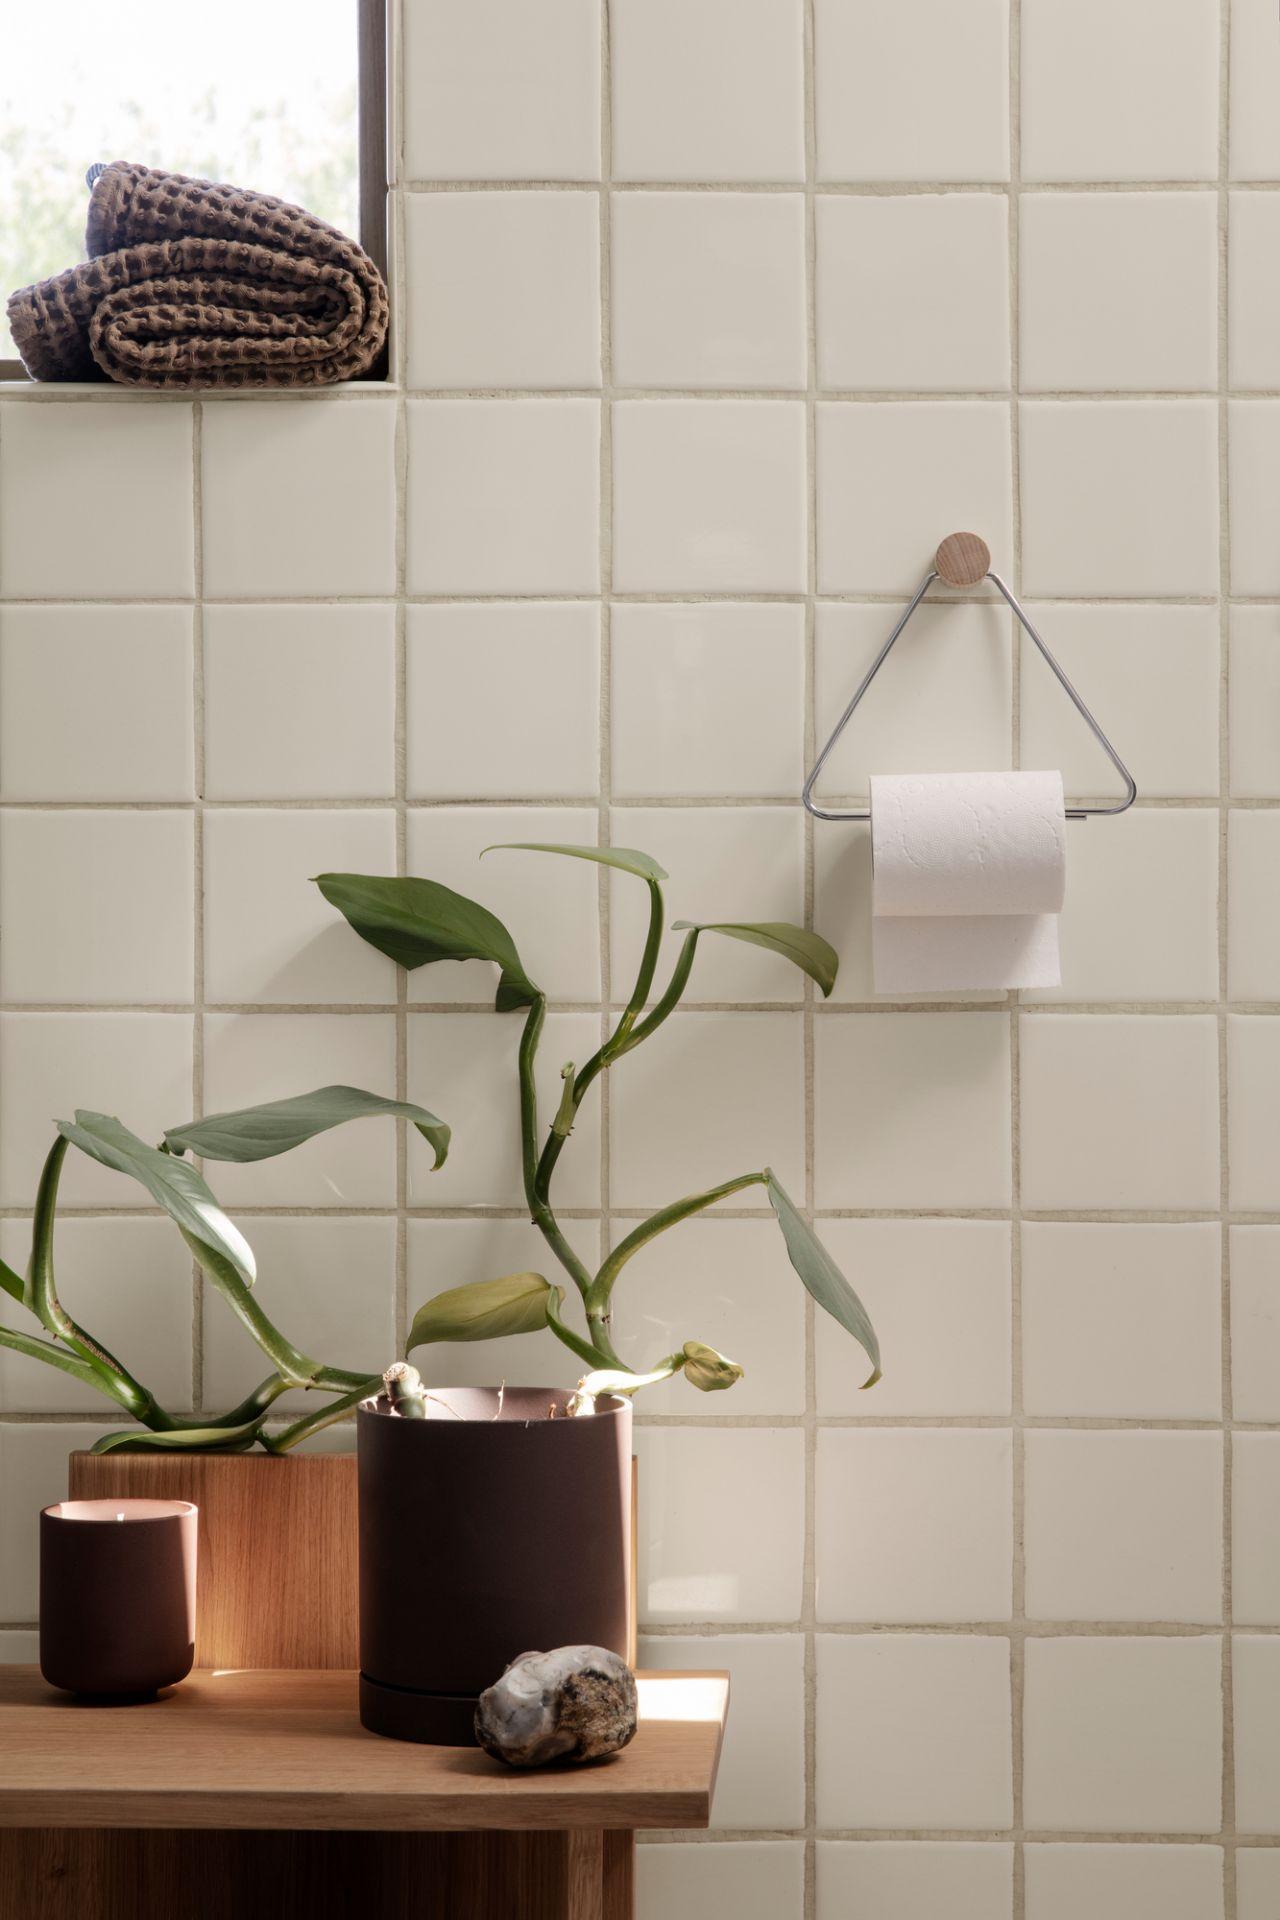 Toilet Paper Holder Toilettenpapierhalter Ferm Living schwarz